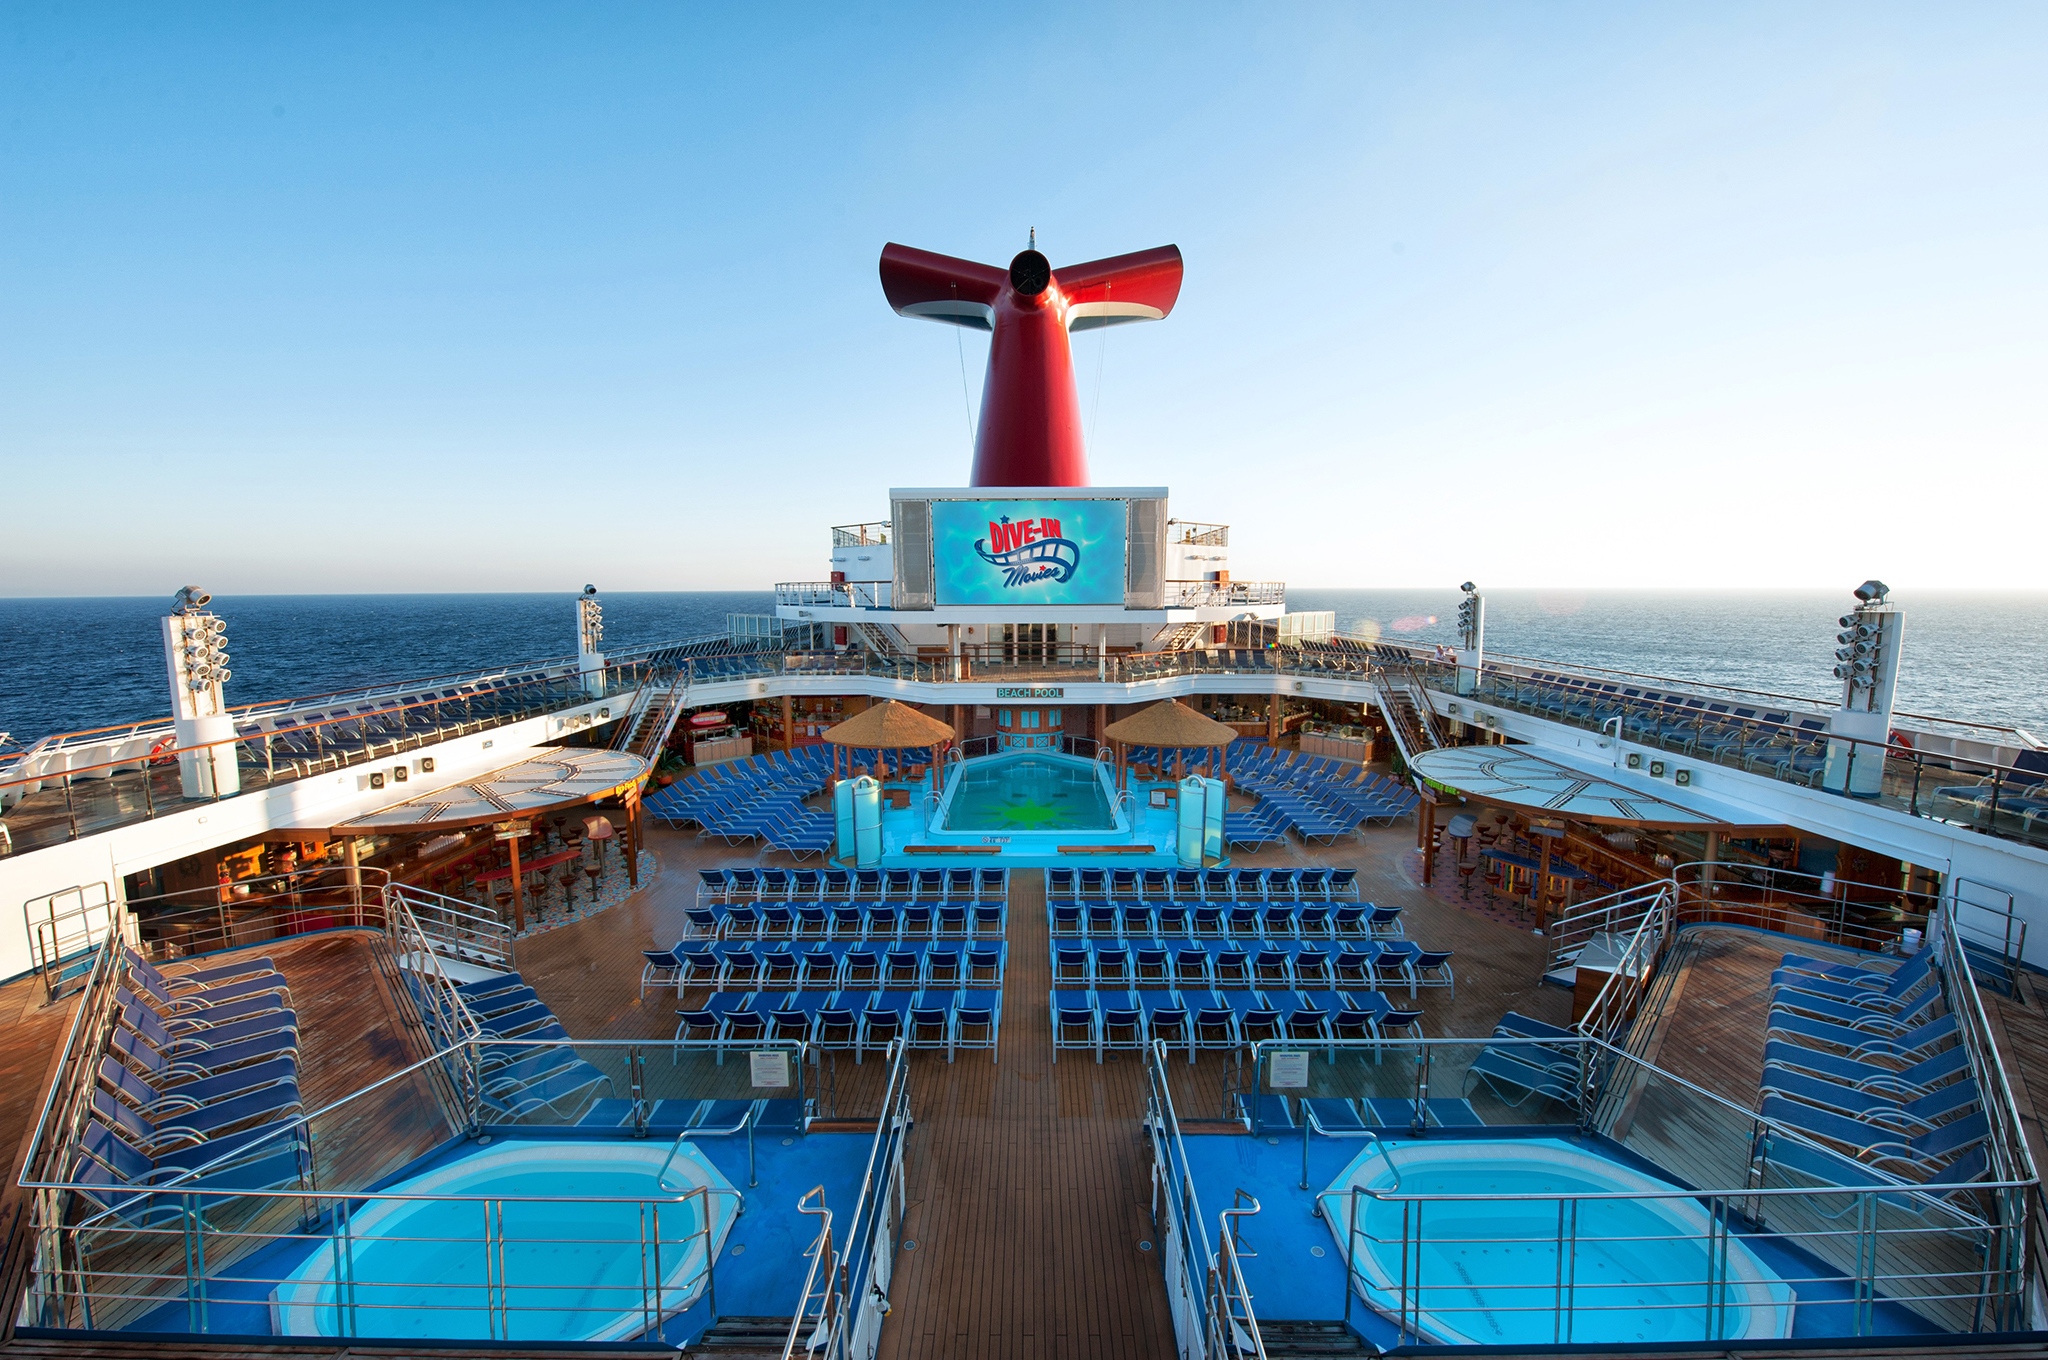 carnival sunshine kreuzfahrt schiff